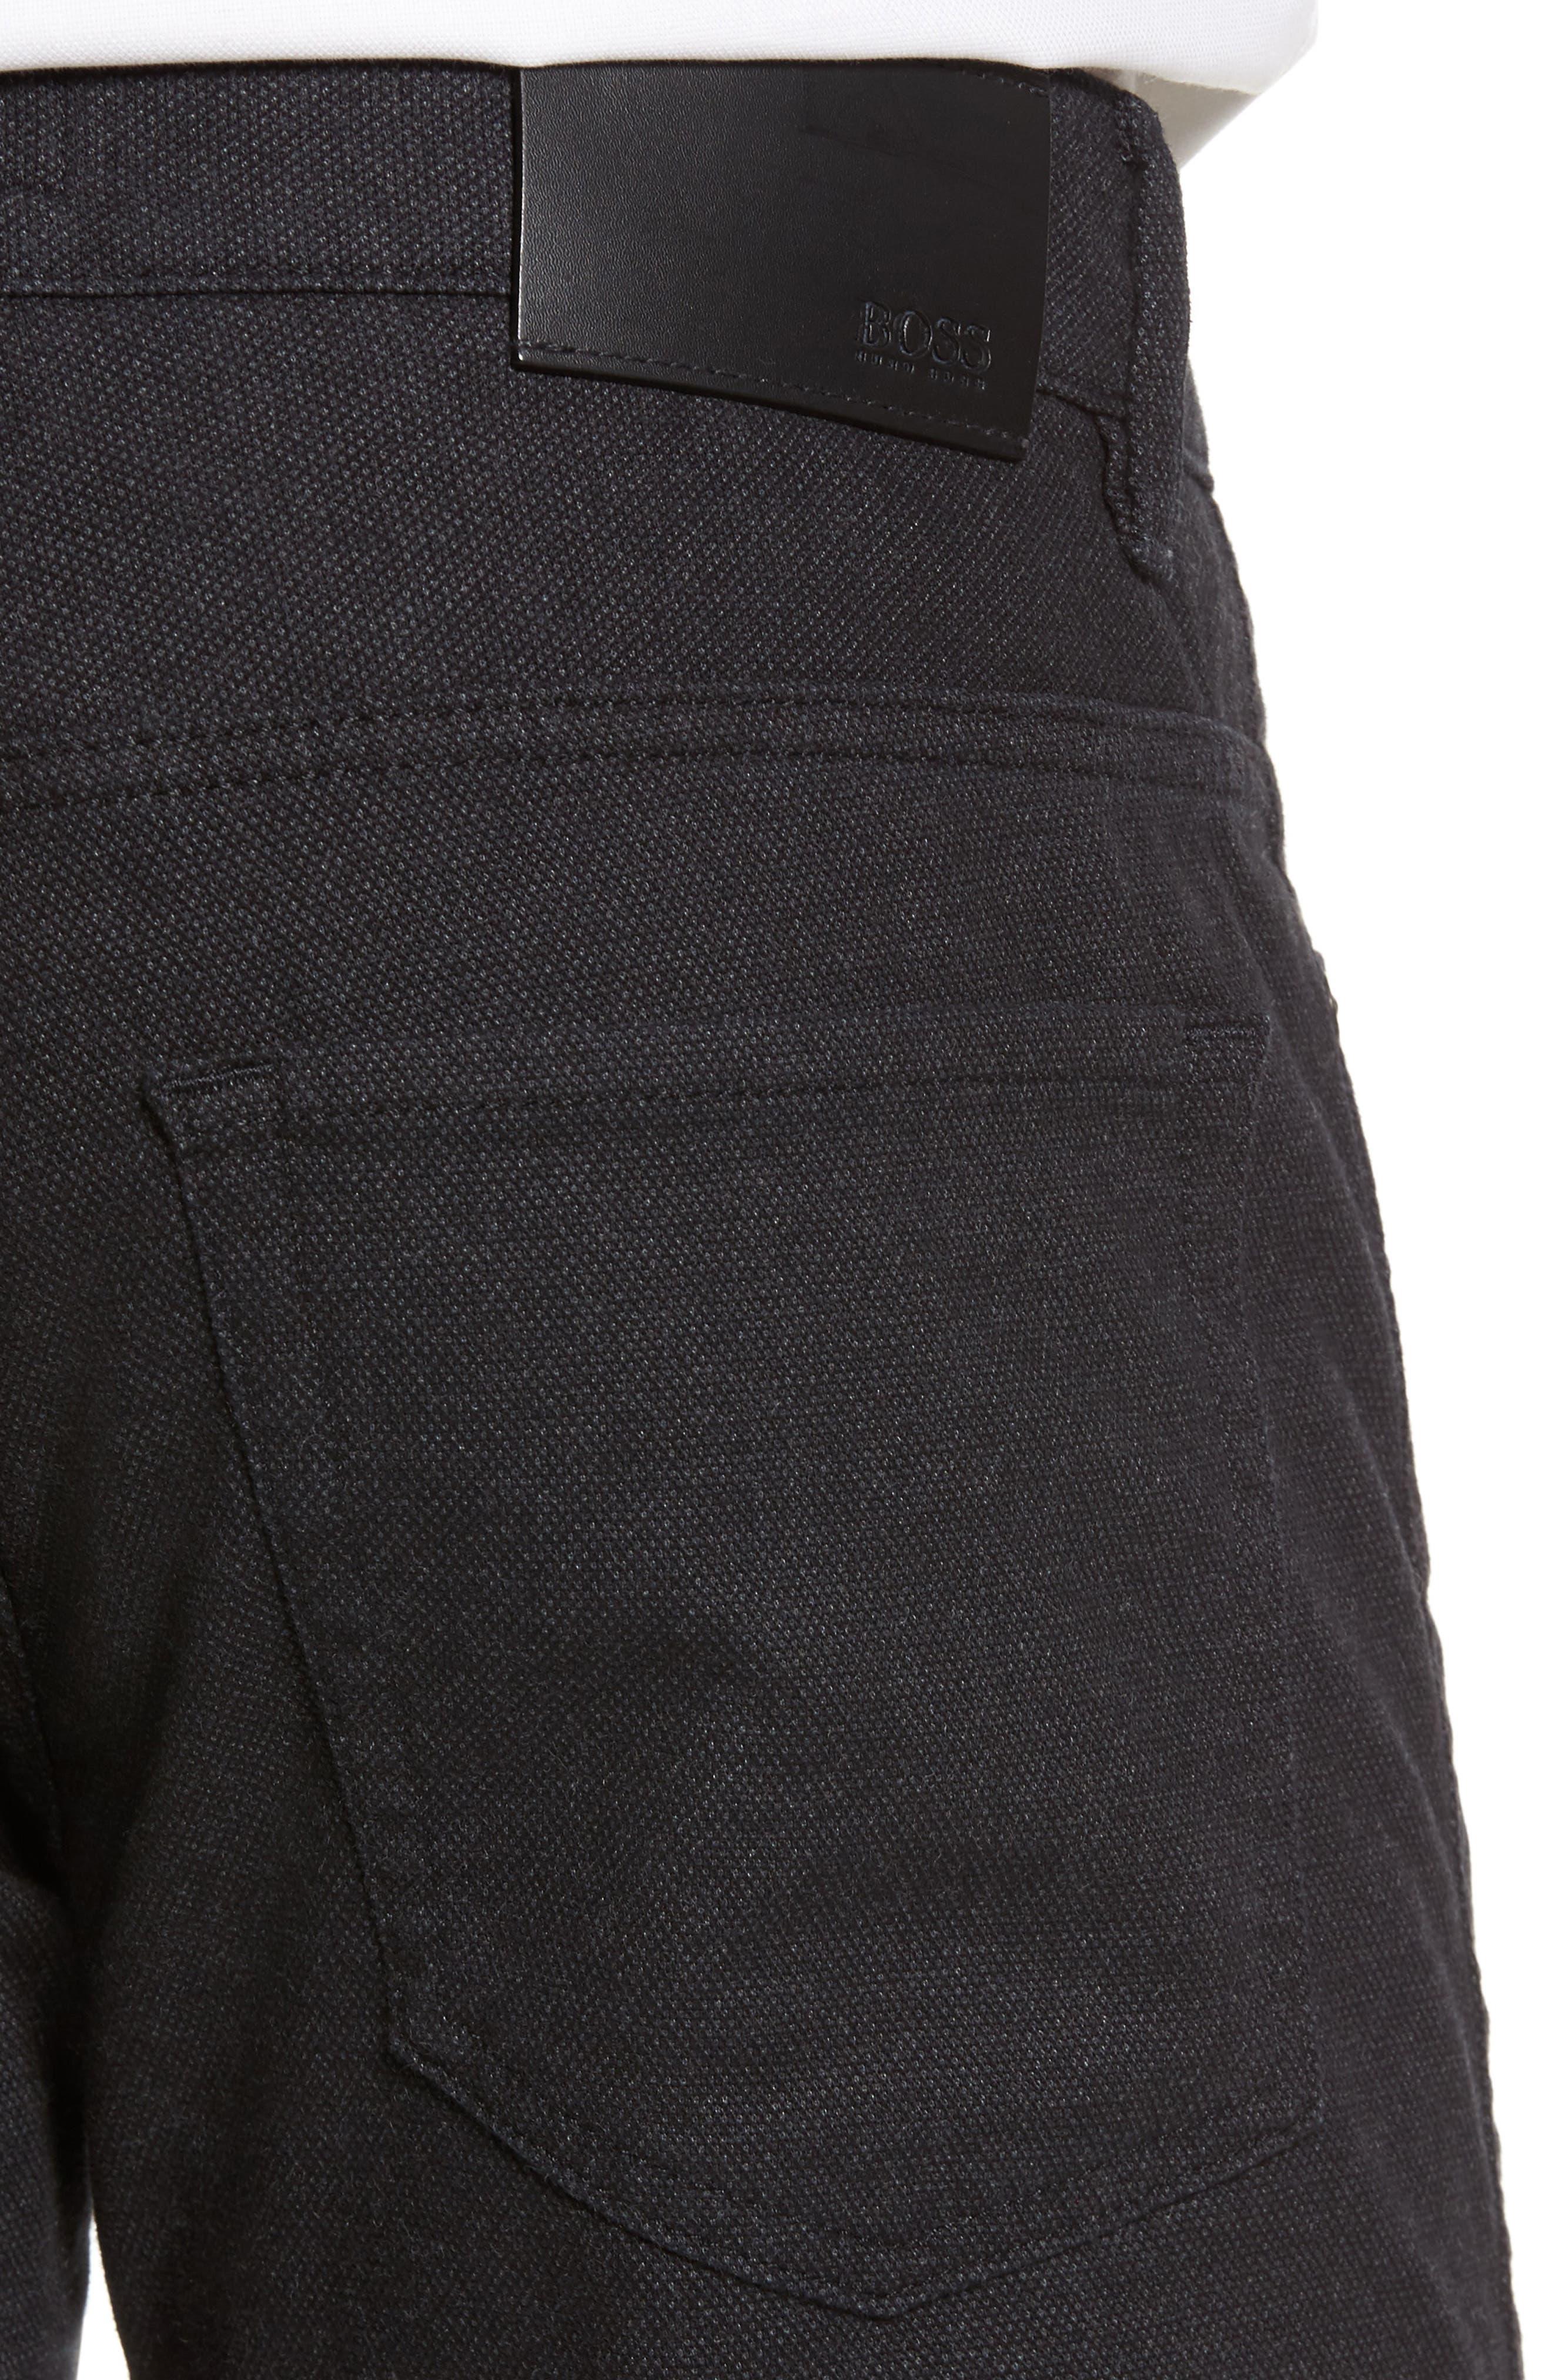 Delaware Slim 5-Pocket Pants,                             Alternate thumbnail 4, color,                             022